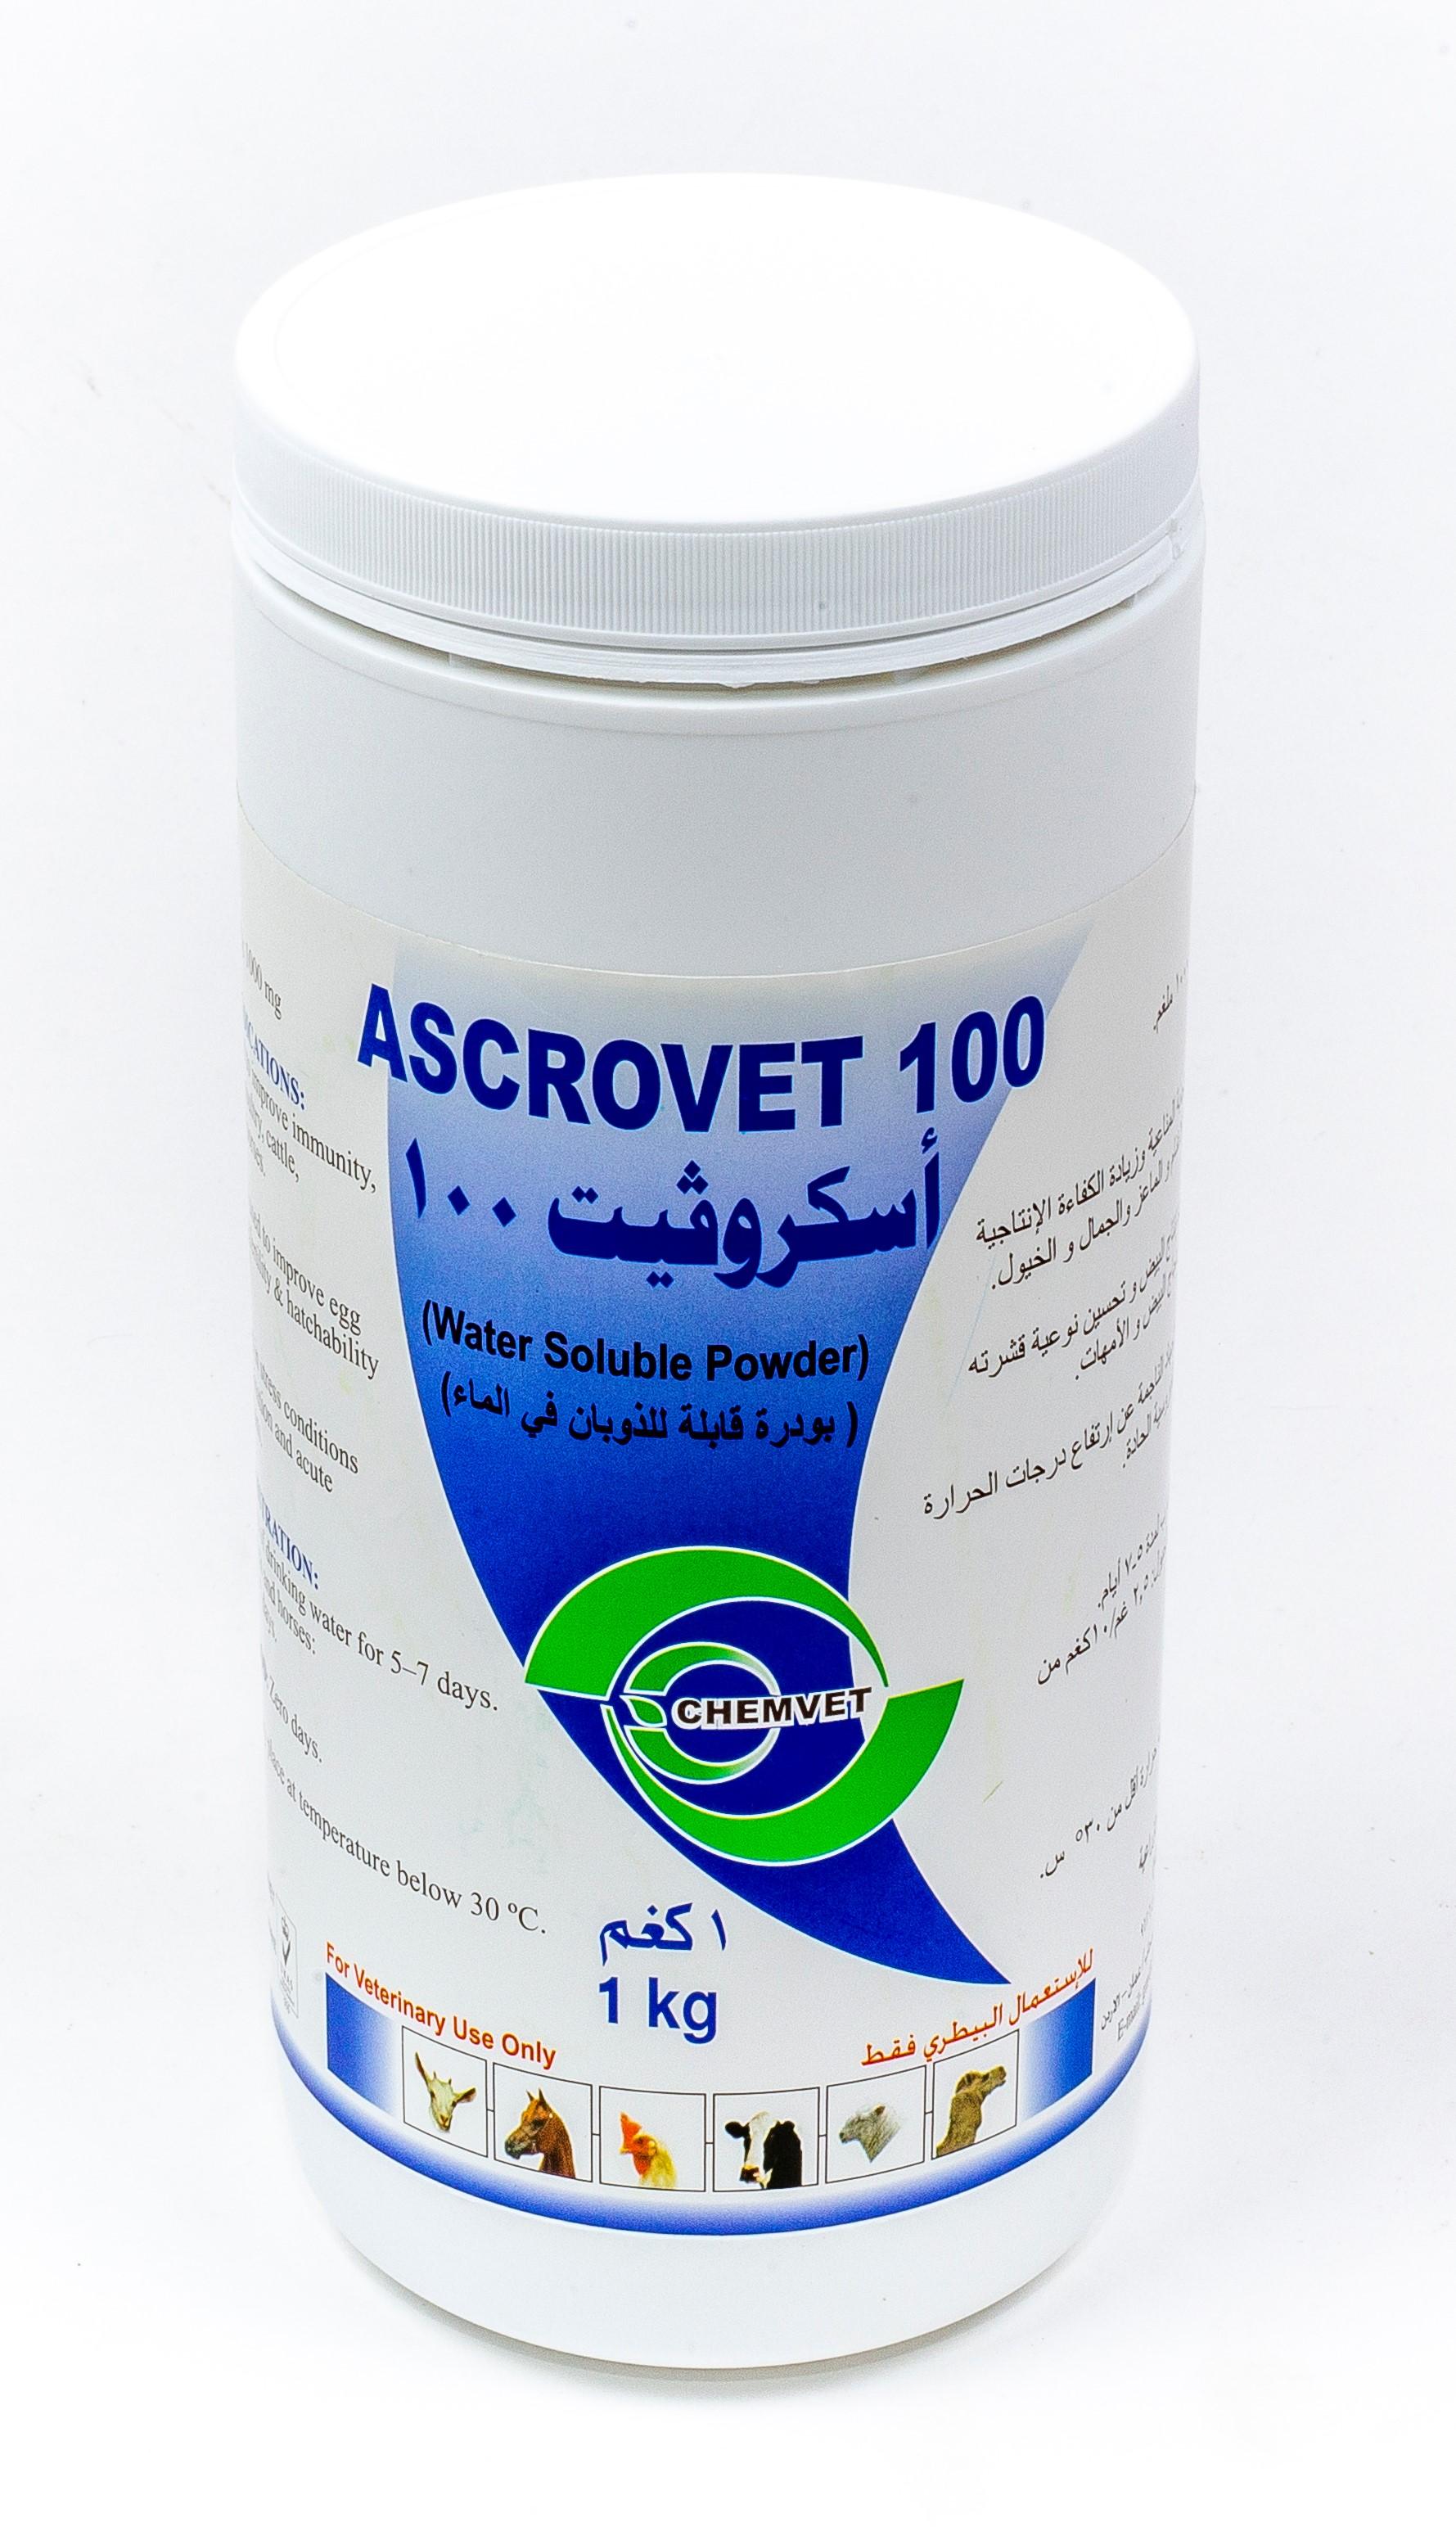 ASCROVET 100